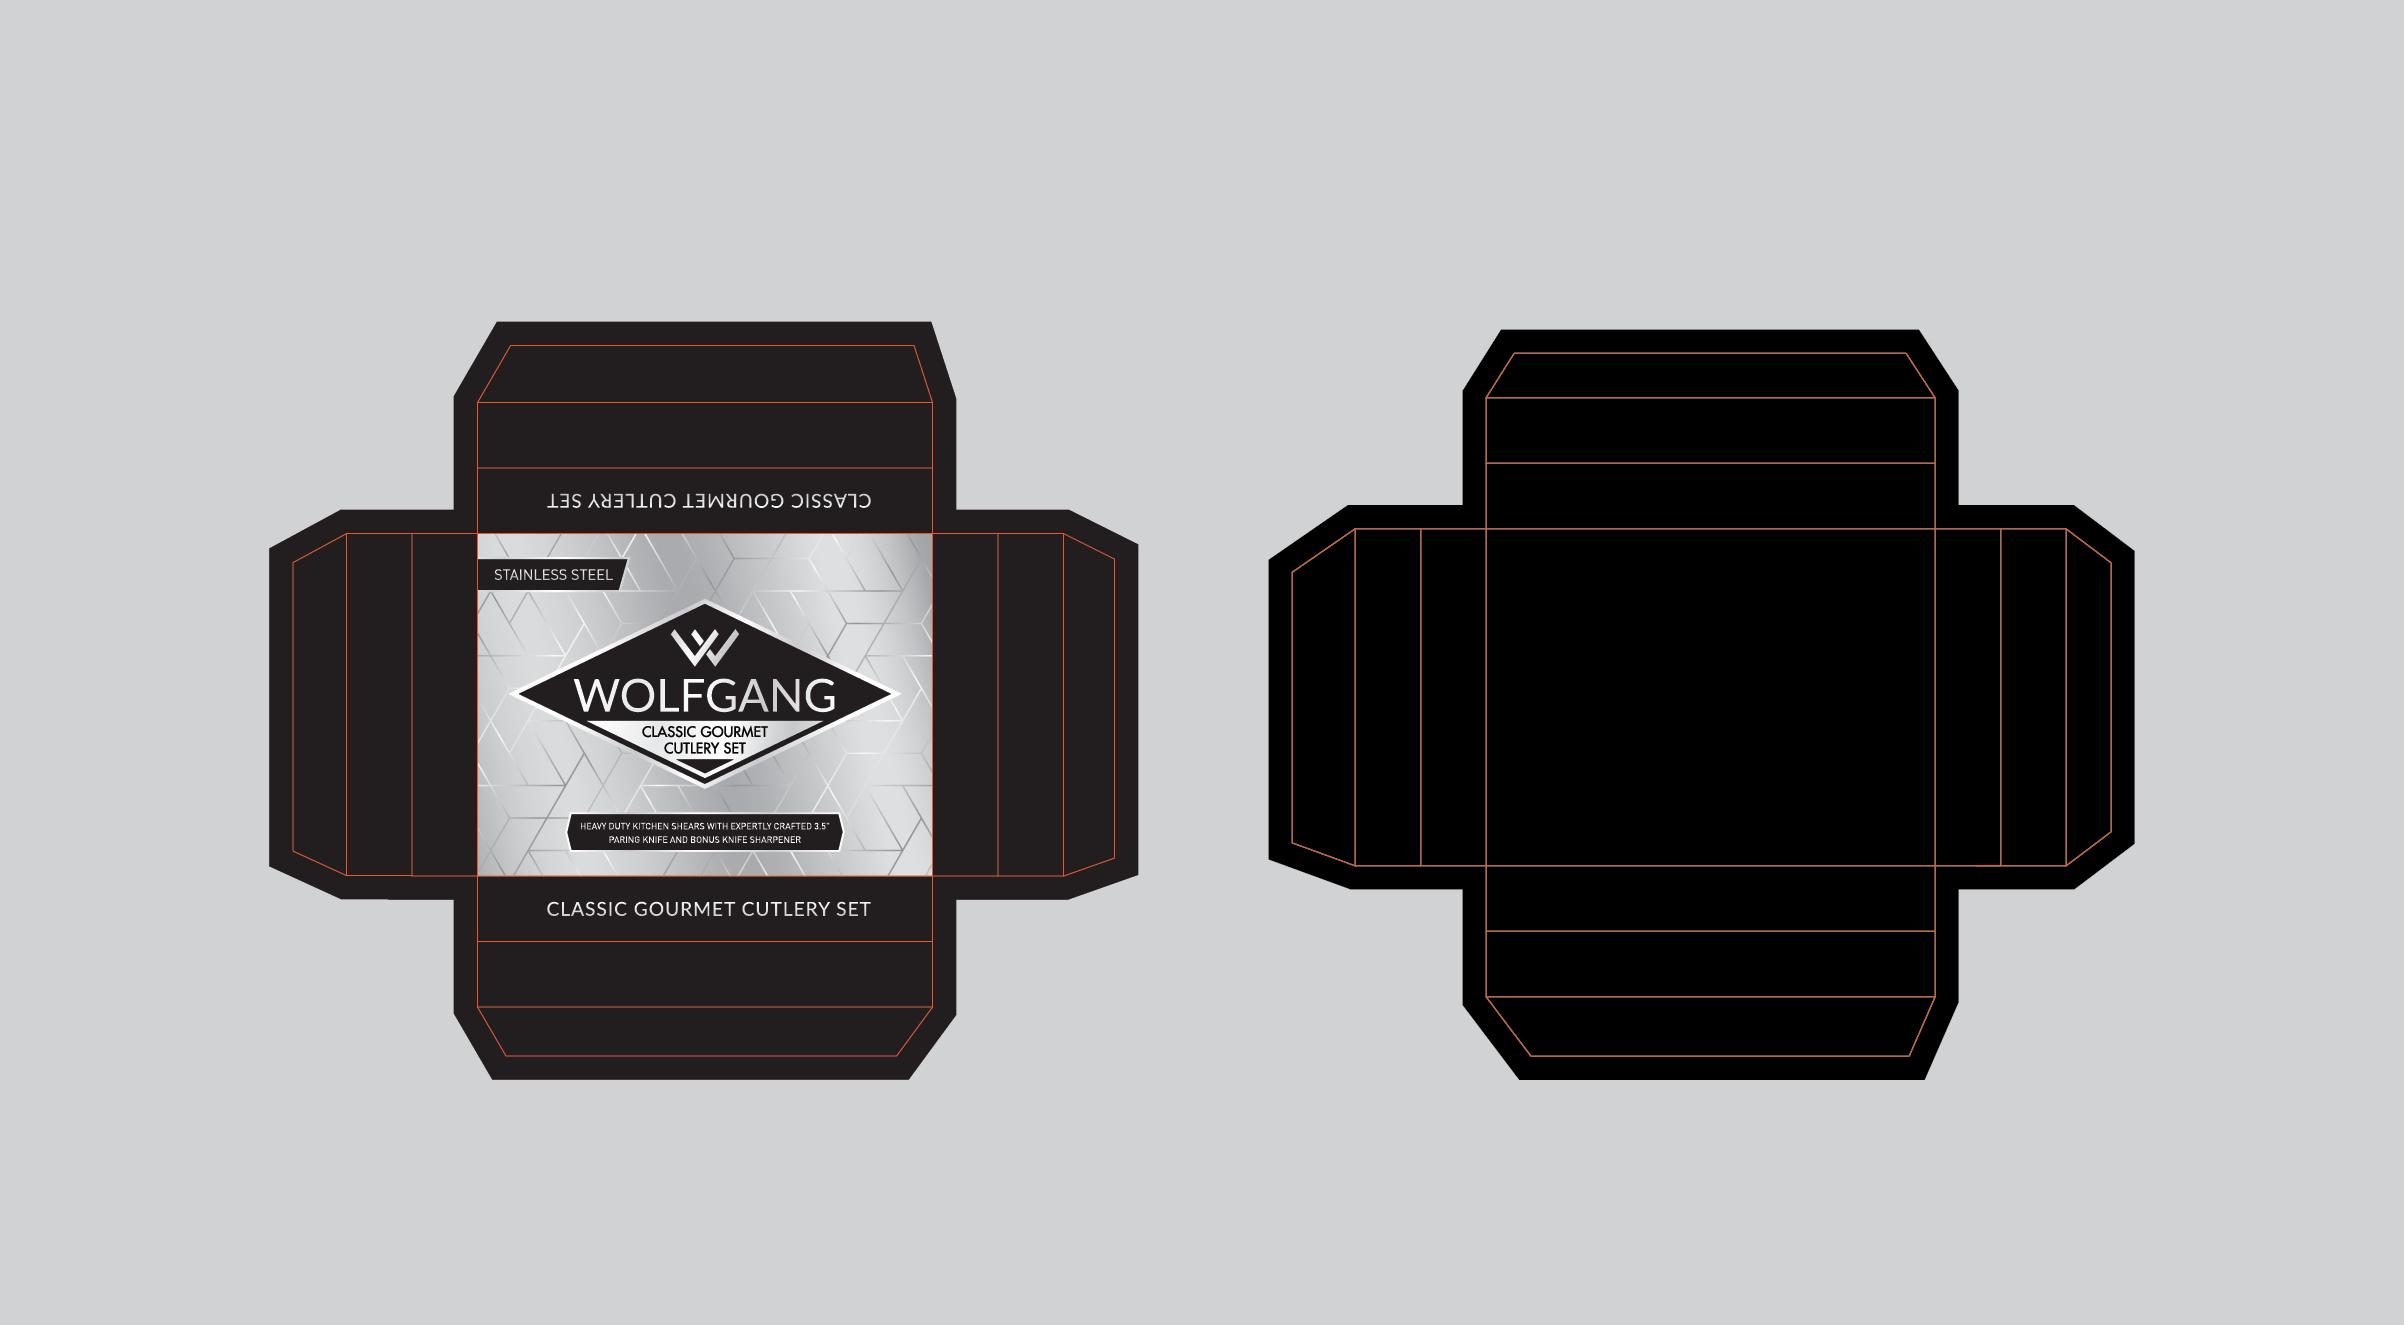 Product packaging for Gourmet Cutlery Set - Kitchen Shears, Paring Knife & Bonus Knife Sharpener